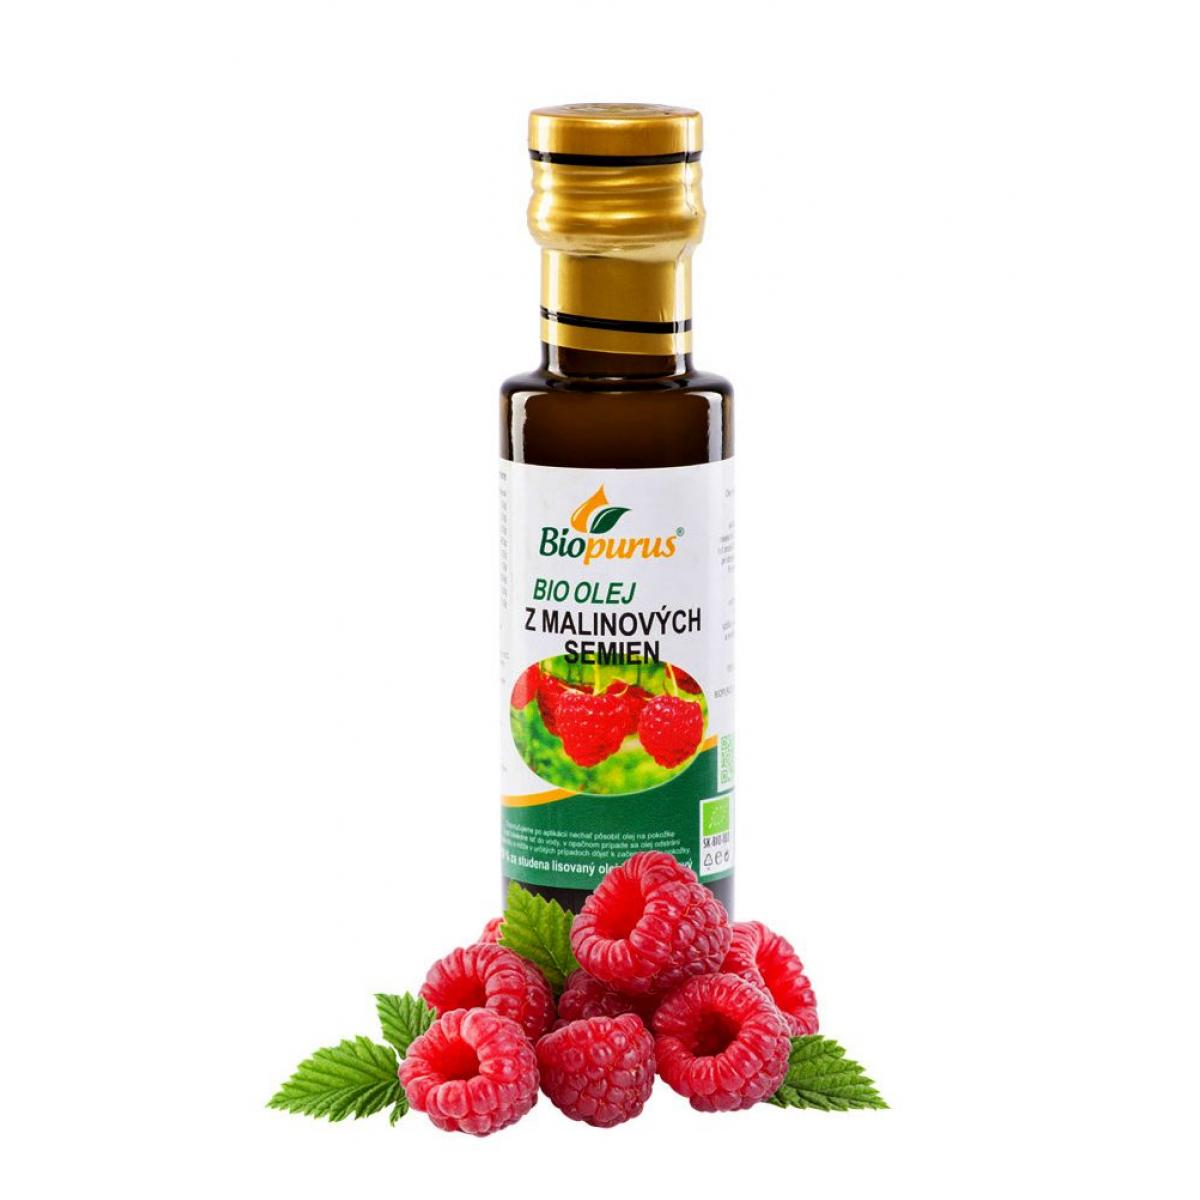 Olej z Malinových semien BIO - 100 ml - Biopurus